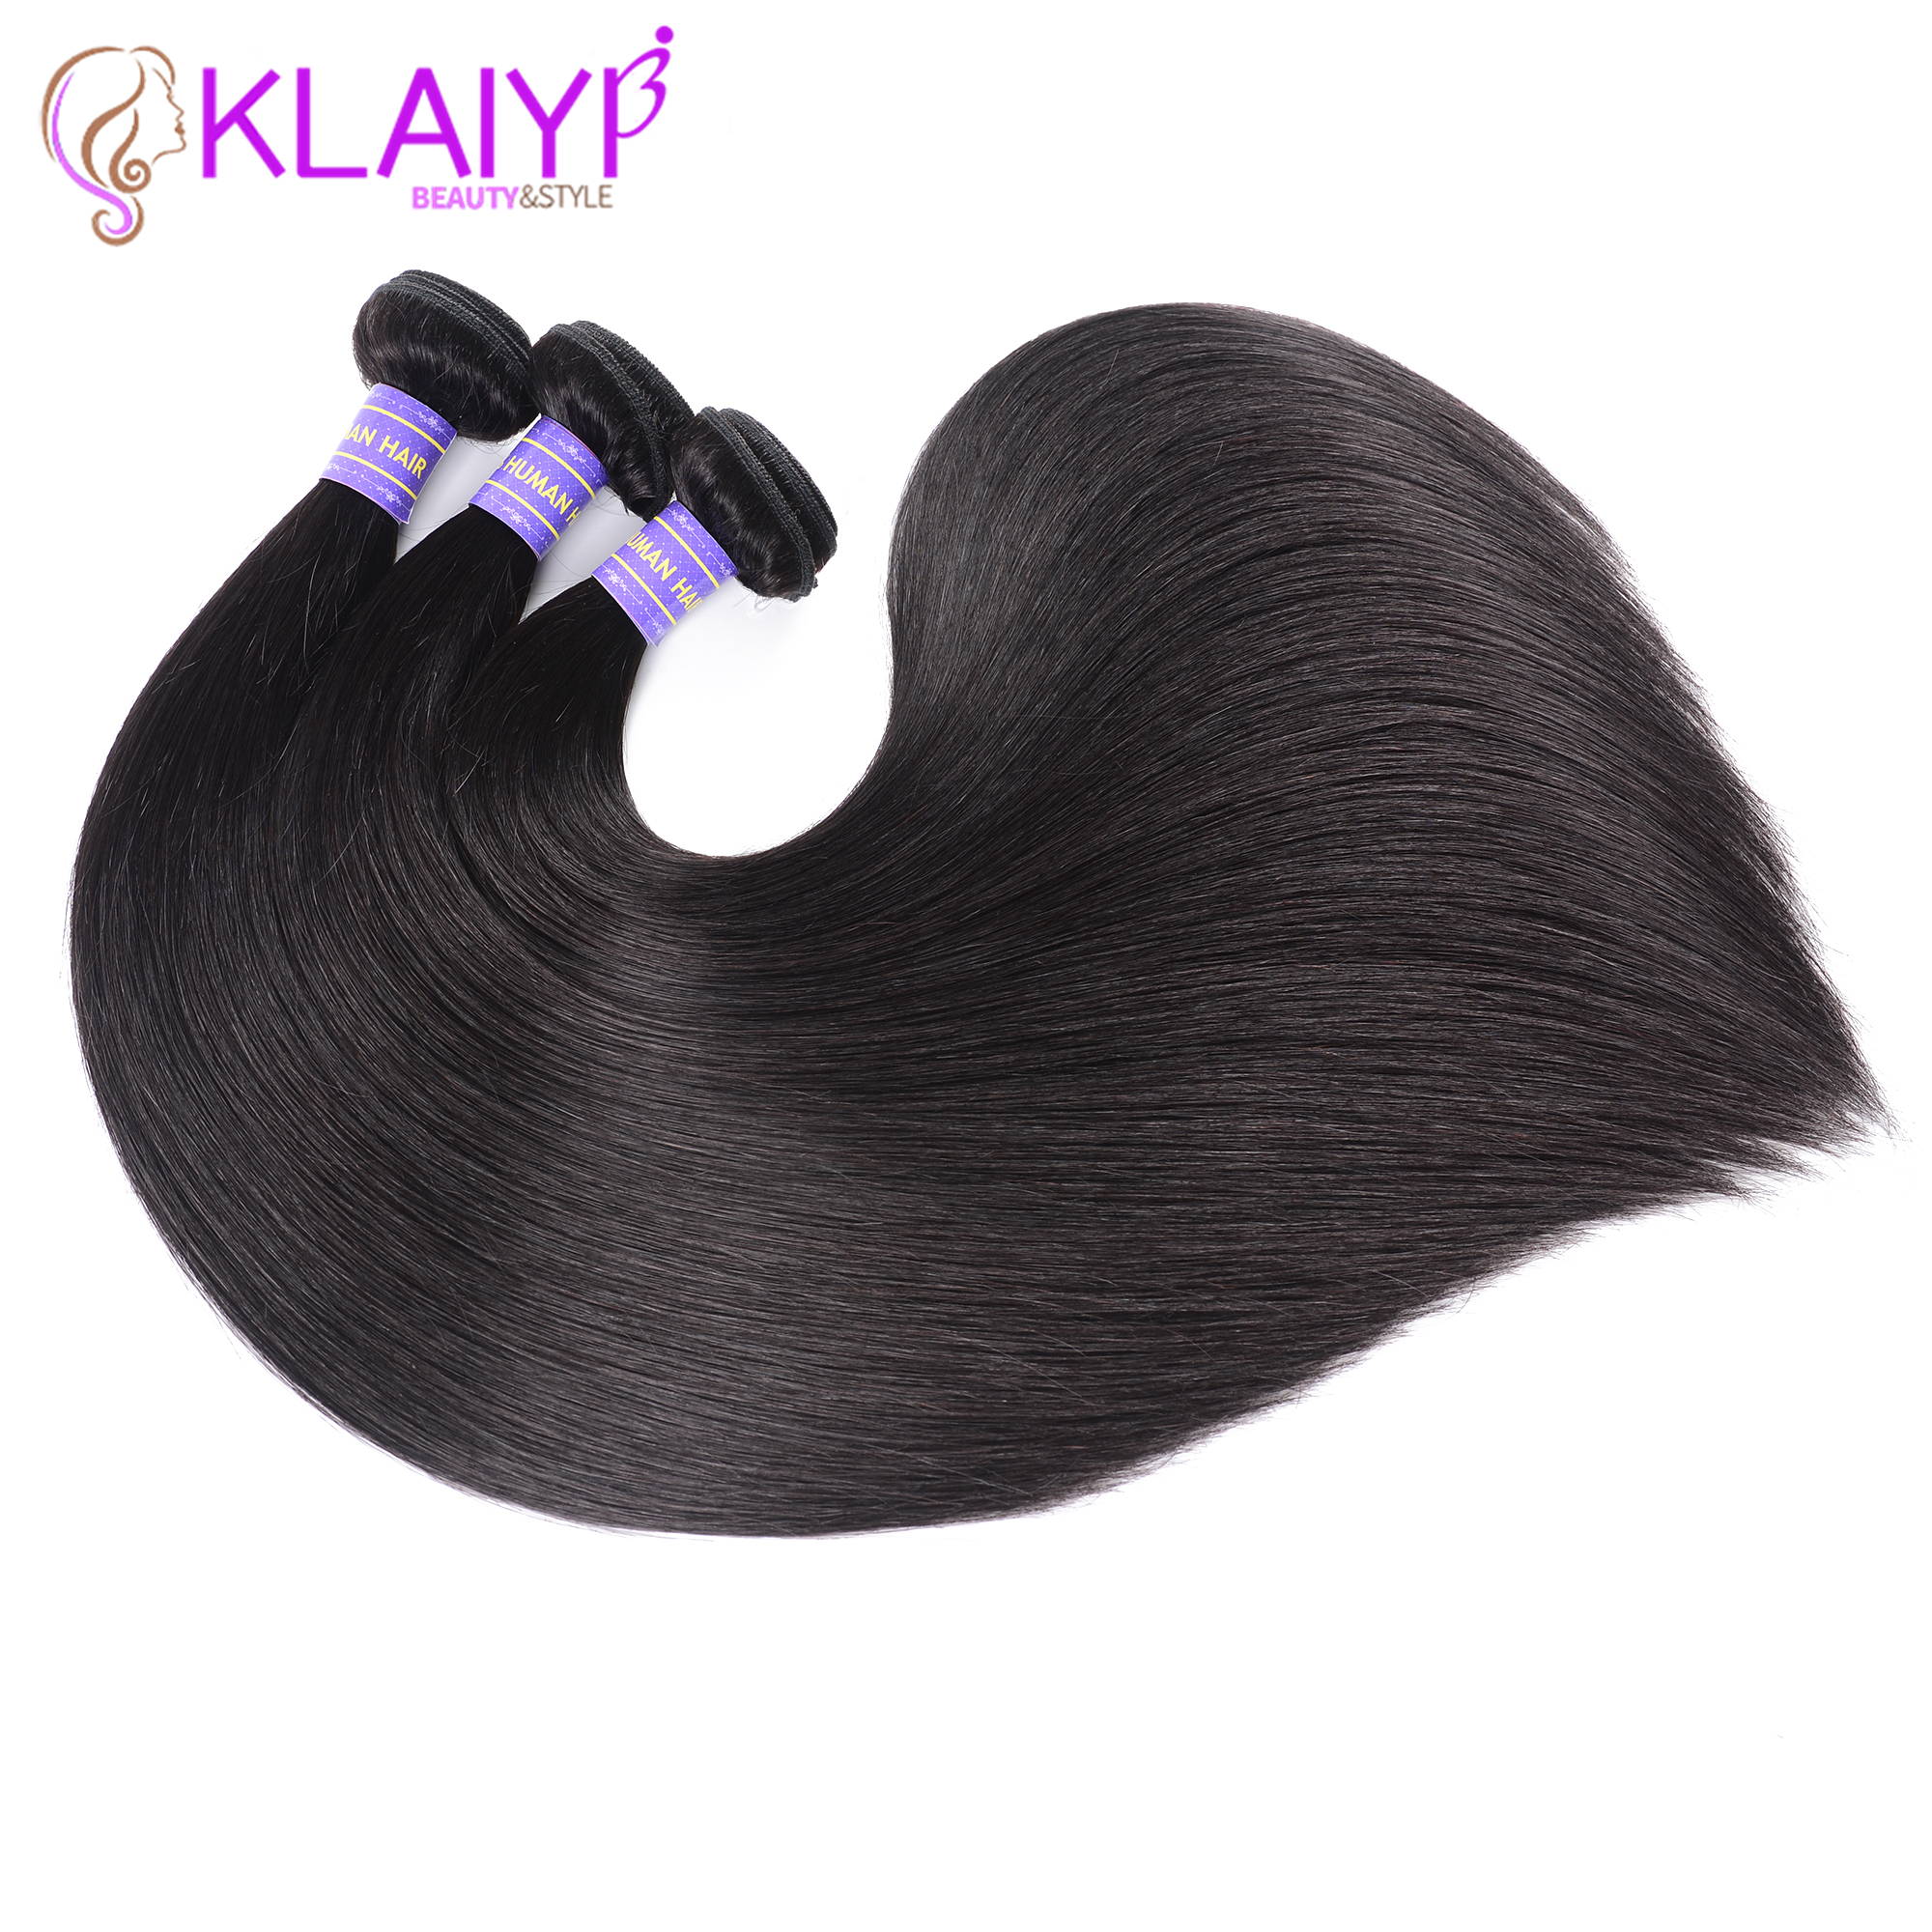 Klaiyi Hair Products Brazilian Hair Weave Bundles Straight Hair Bundles 8-26 Inch Dark Black Color 1